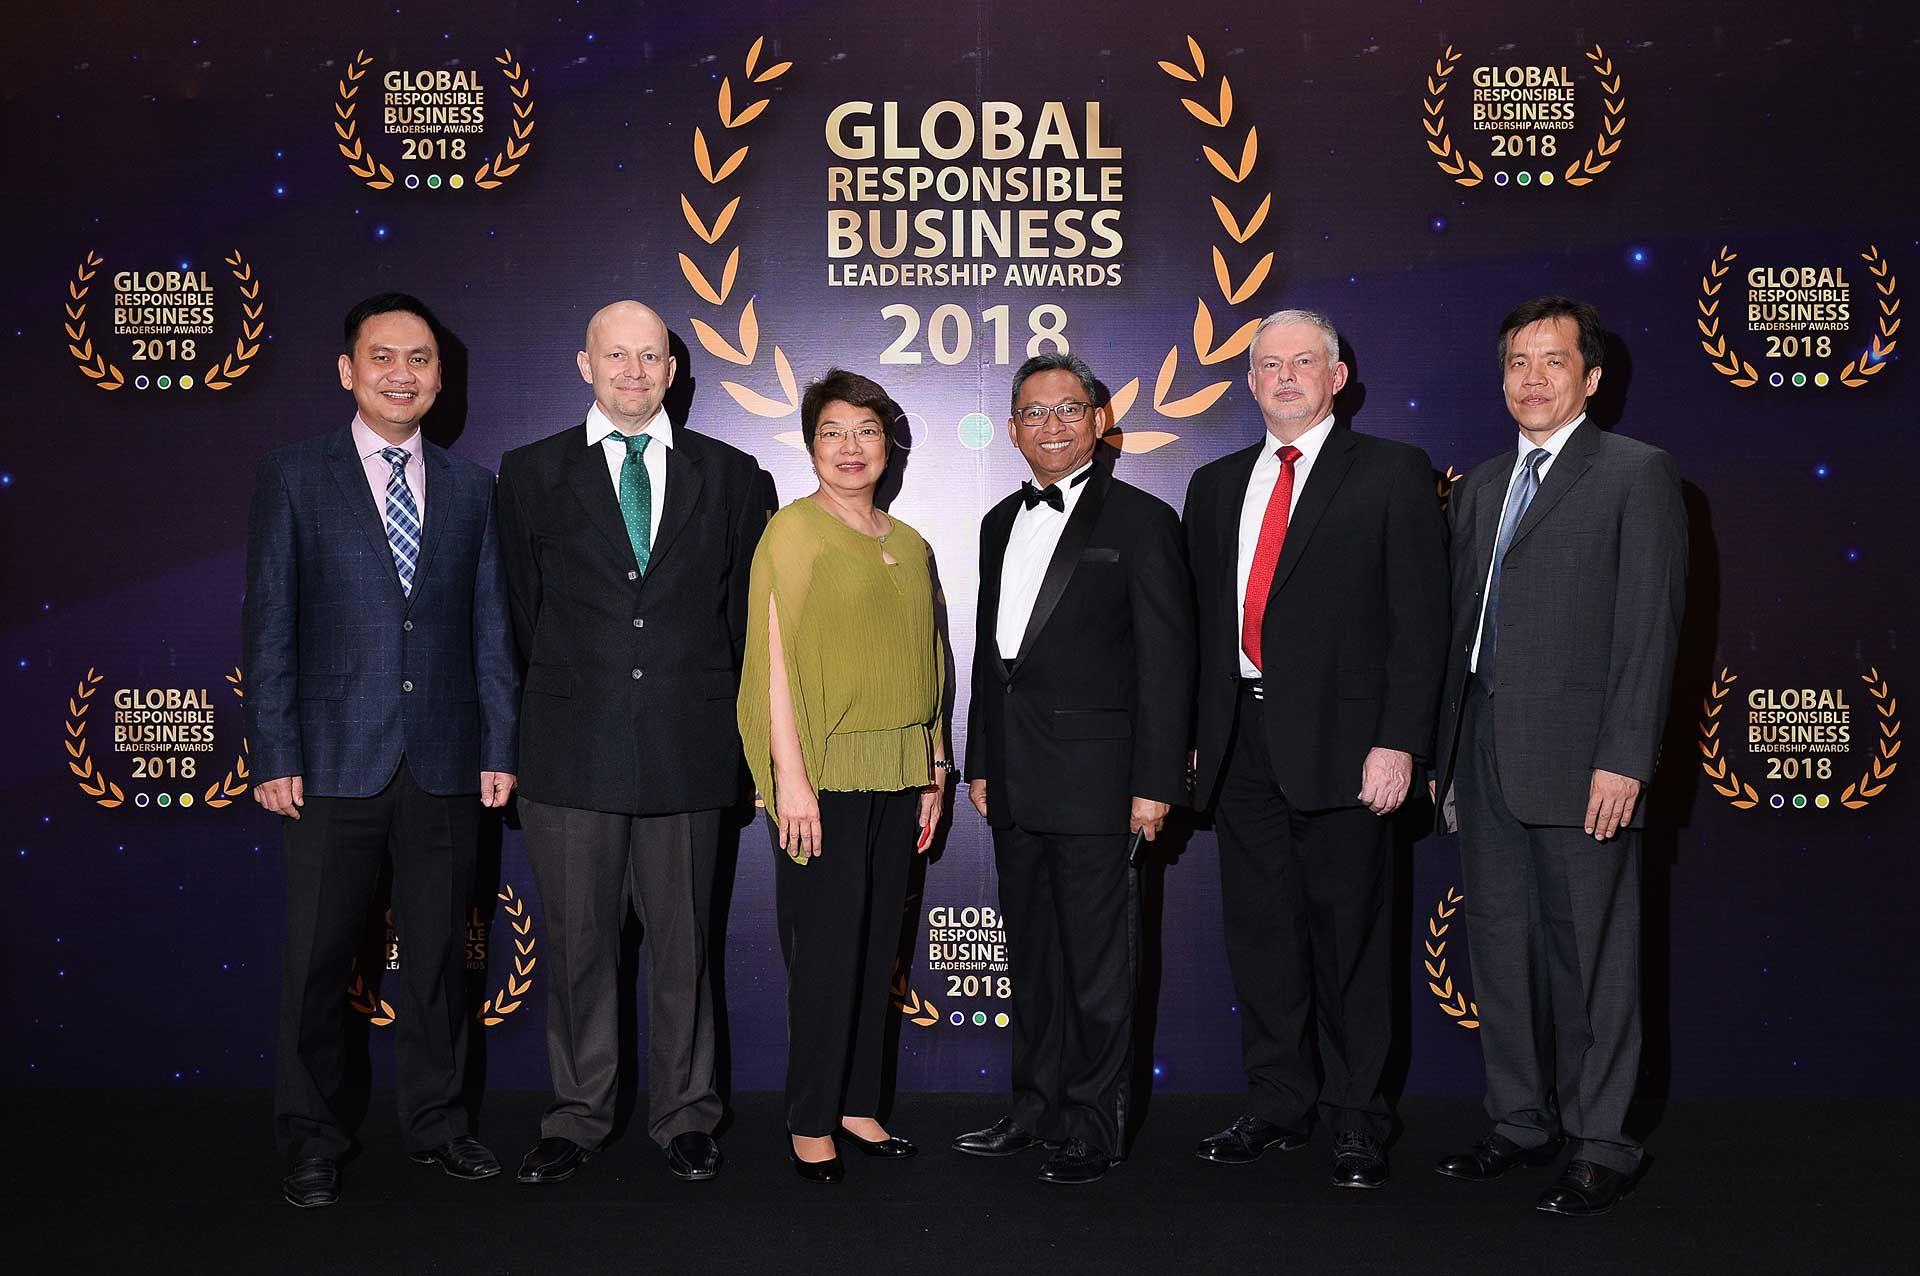 Nguyen Ho Nam, Matthias Gelber, Pacita U Juan, Dato' Azizul Kama Abdul Aziz, Andrew Todd and Johnson Ongking